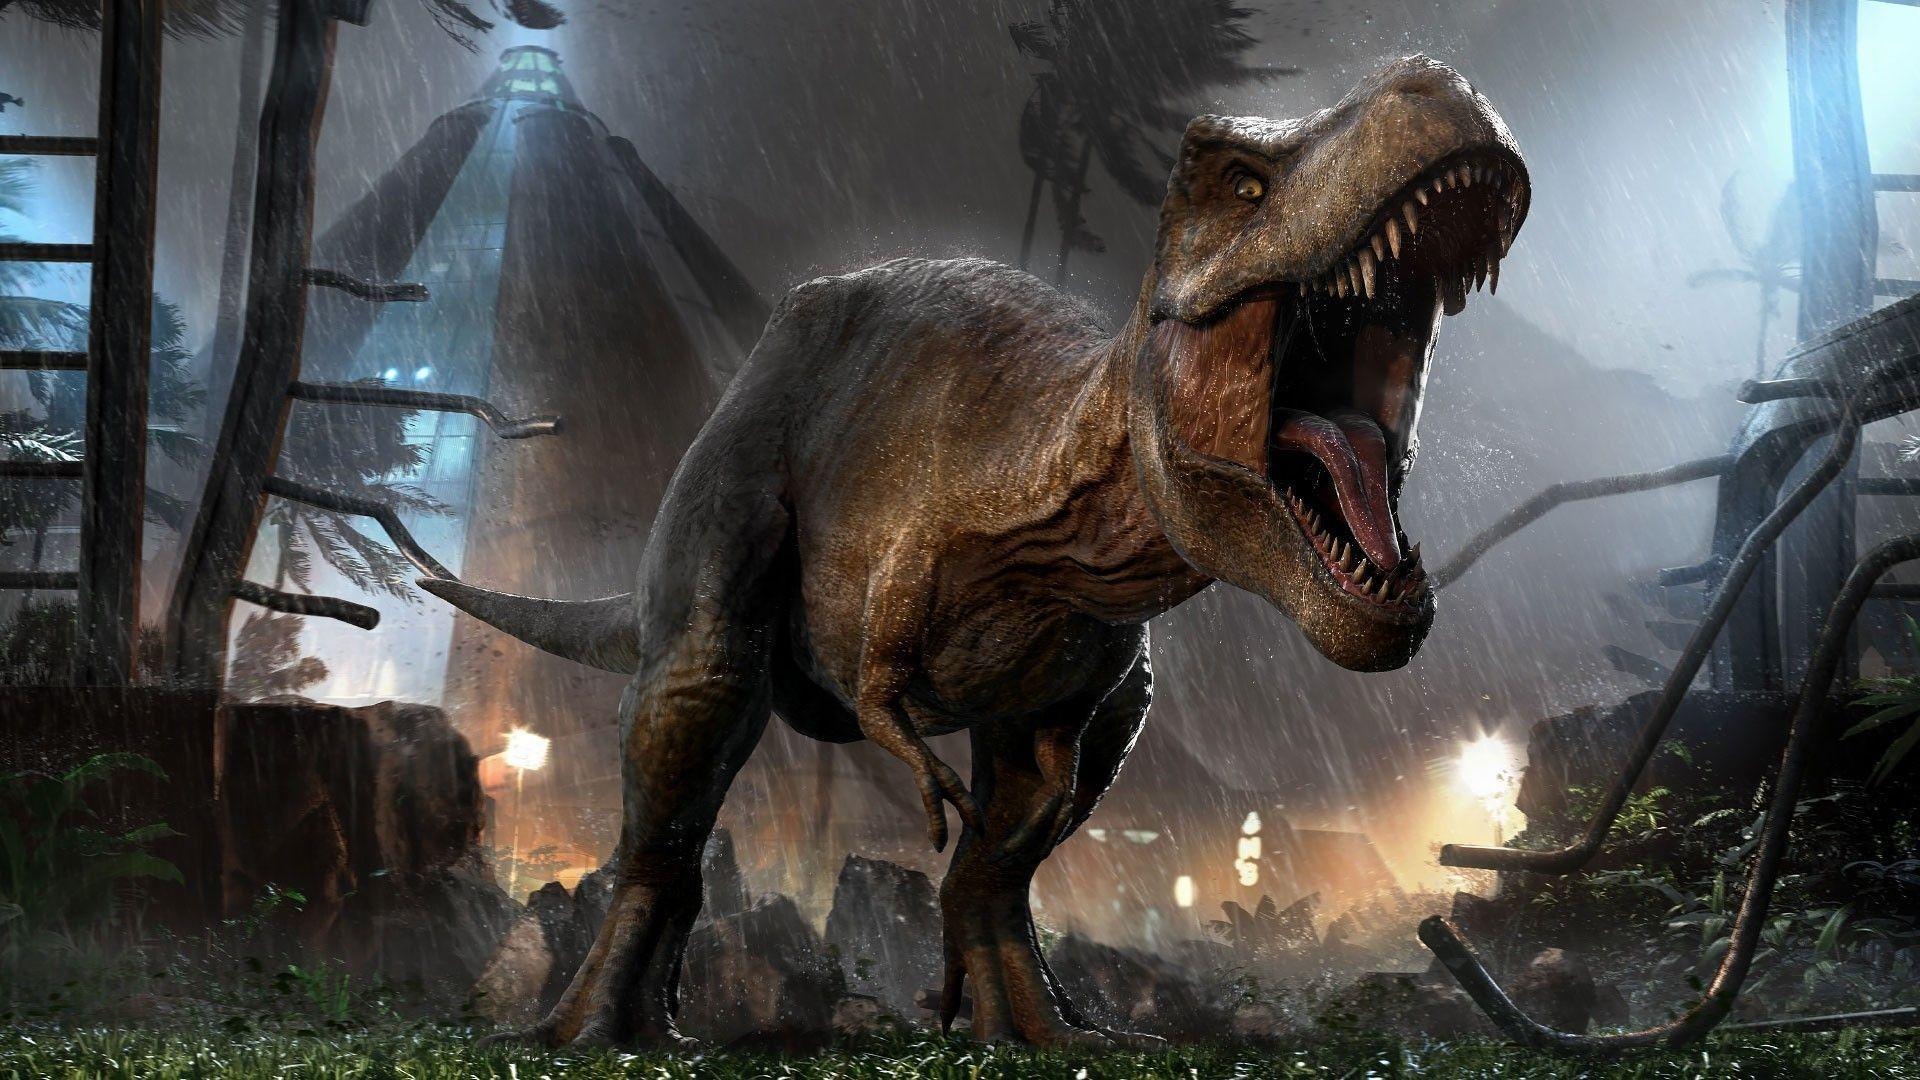 T-Rex Wallpapers - Top Free T-Rex